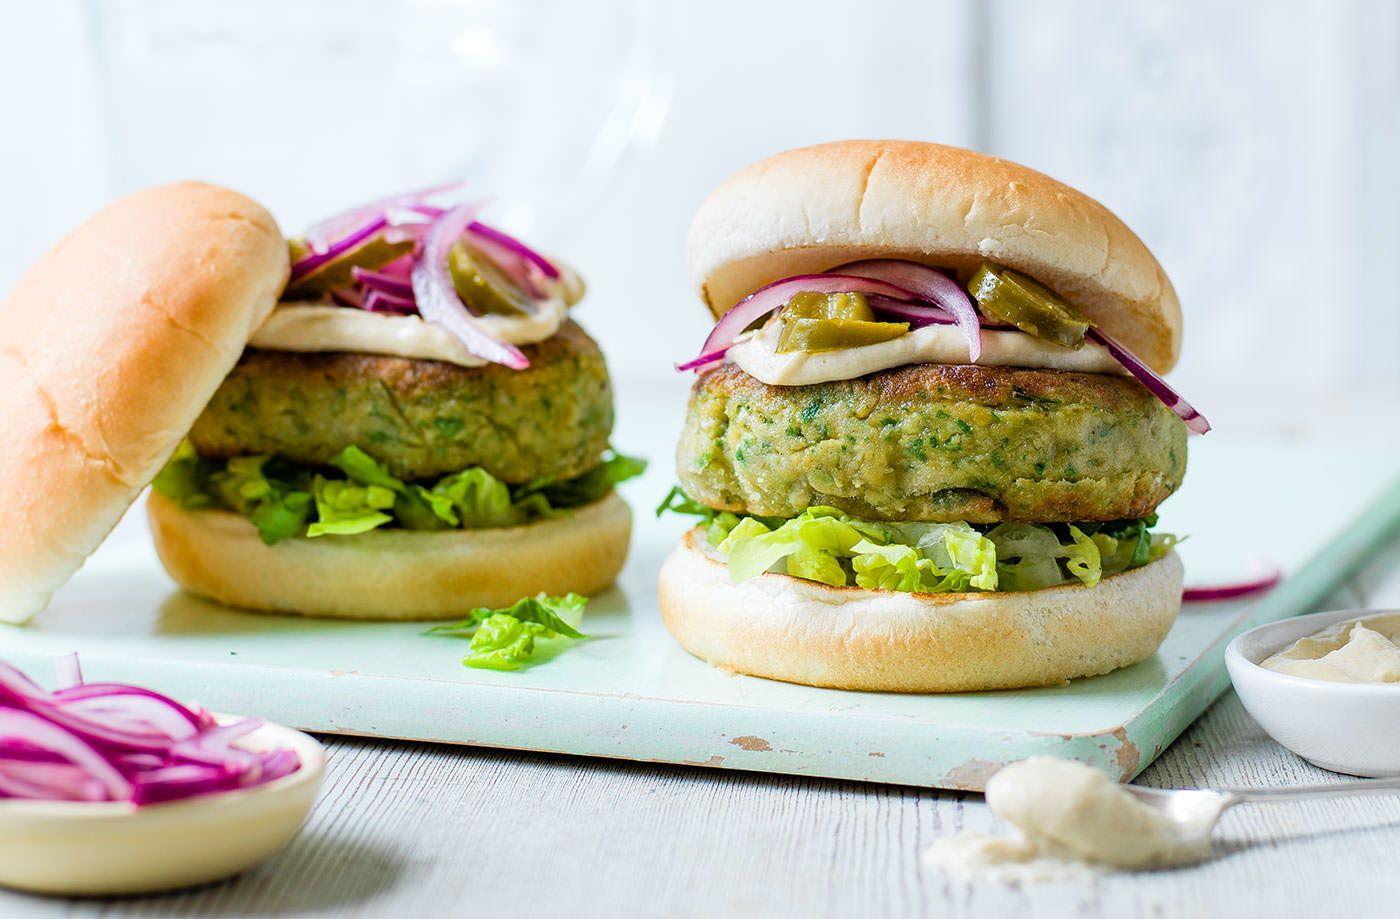 Falafel burger Recipe in 2020 Food recipes, Tesco real